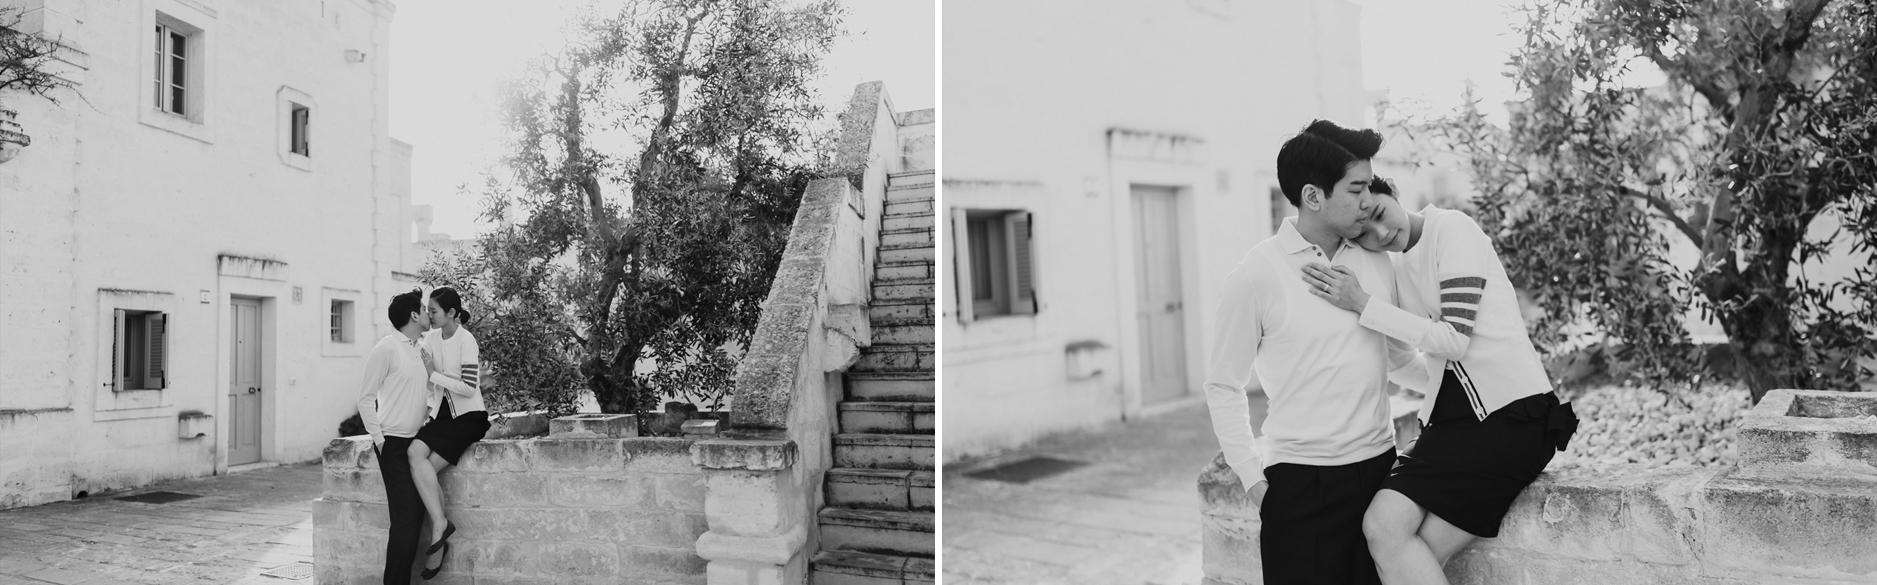 borgo-egnazia-wedding-7